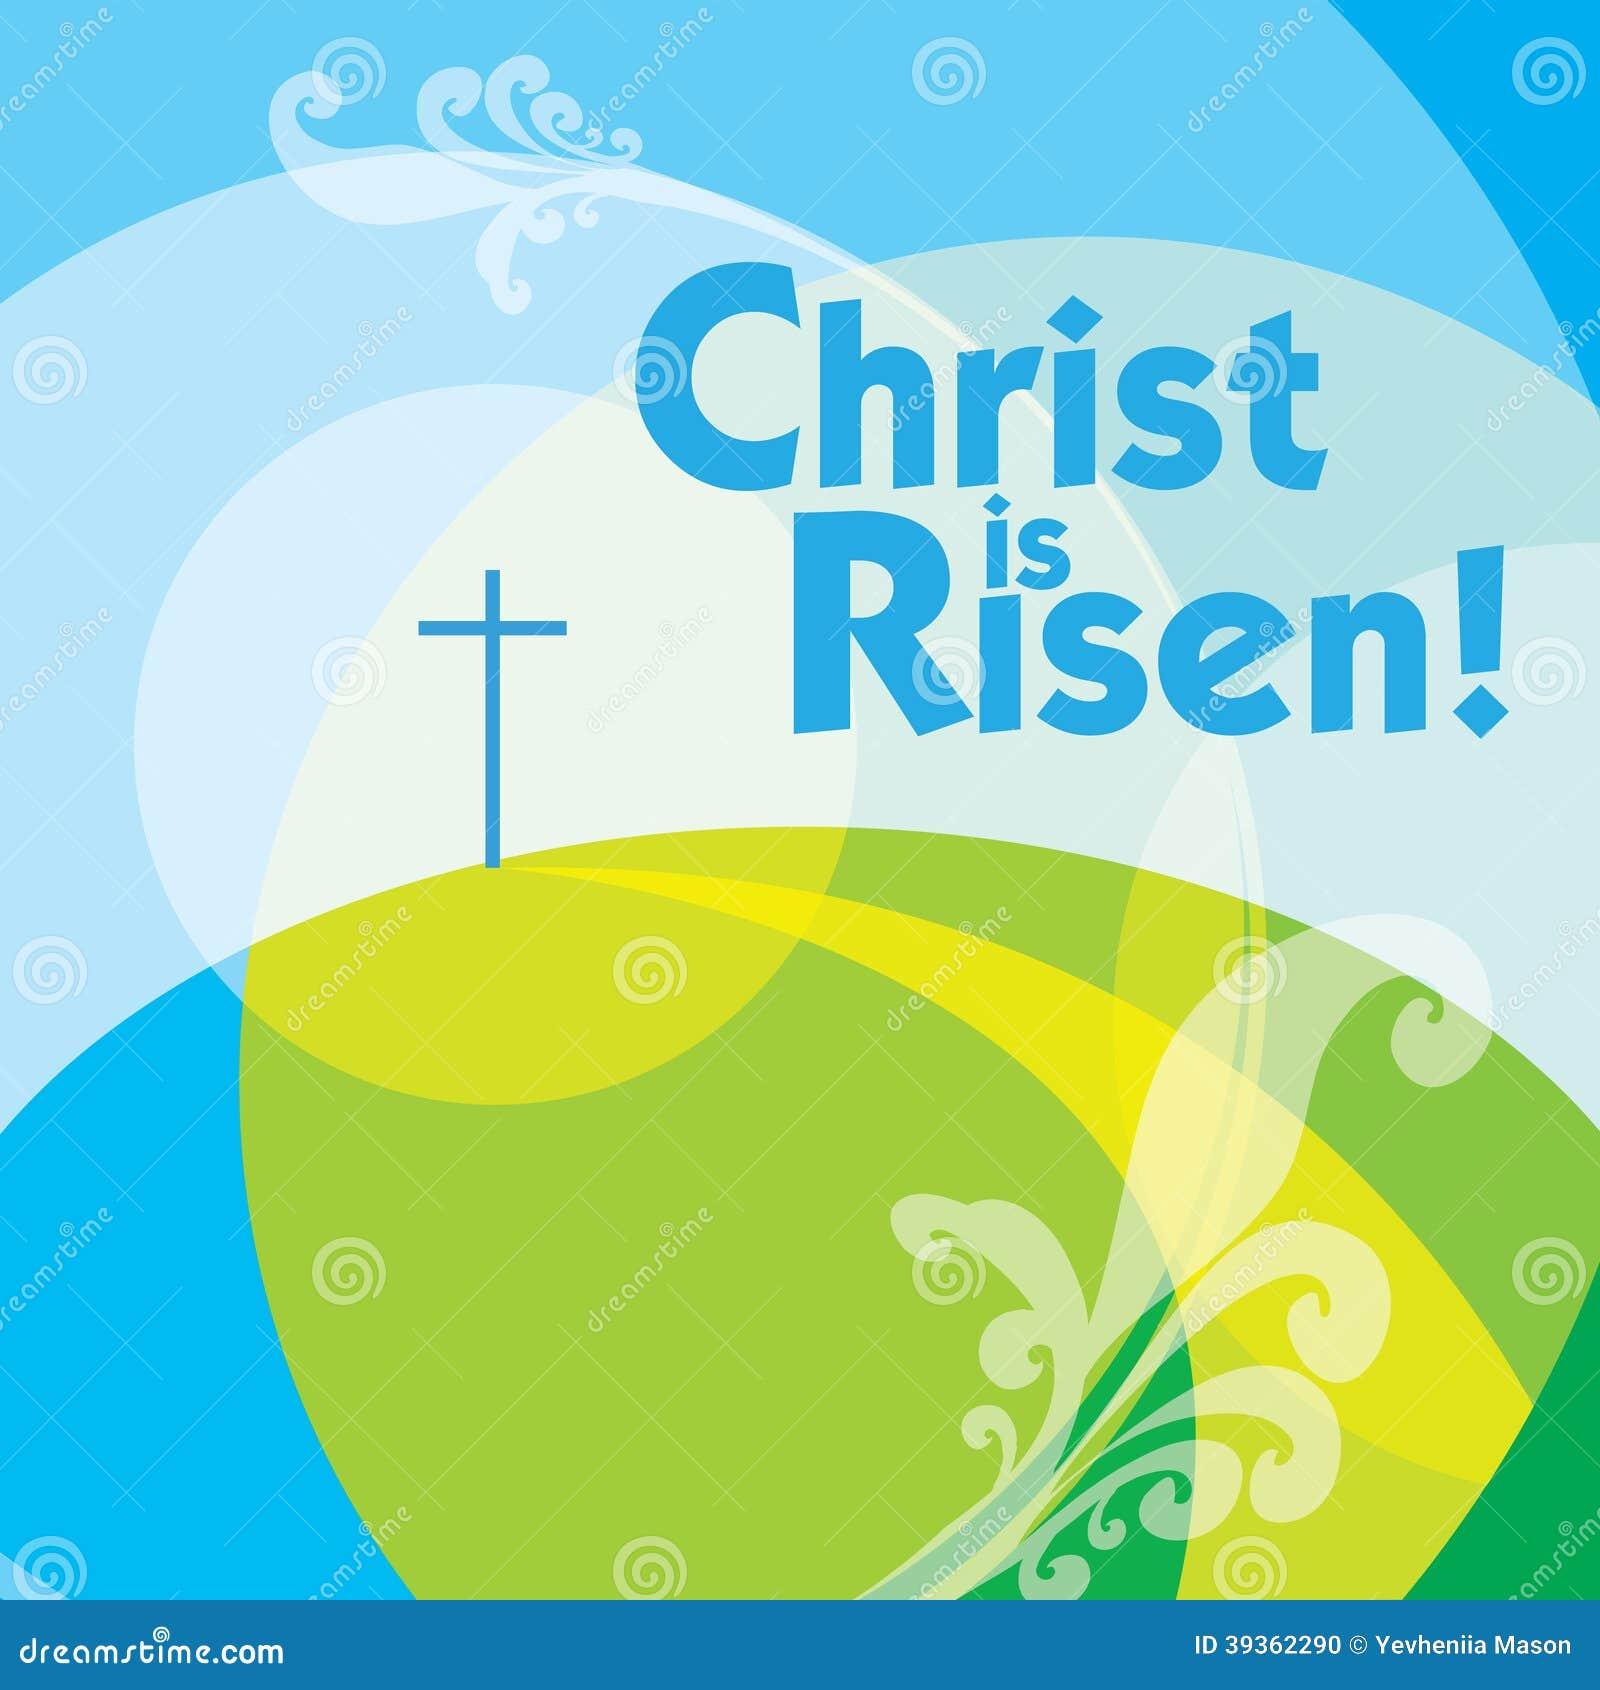 Christ is risen 2